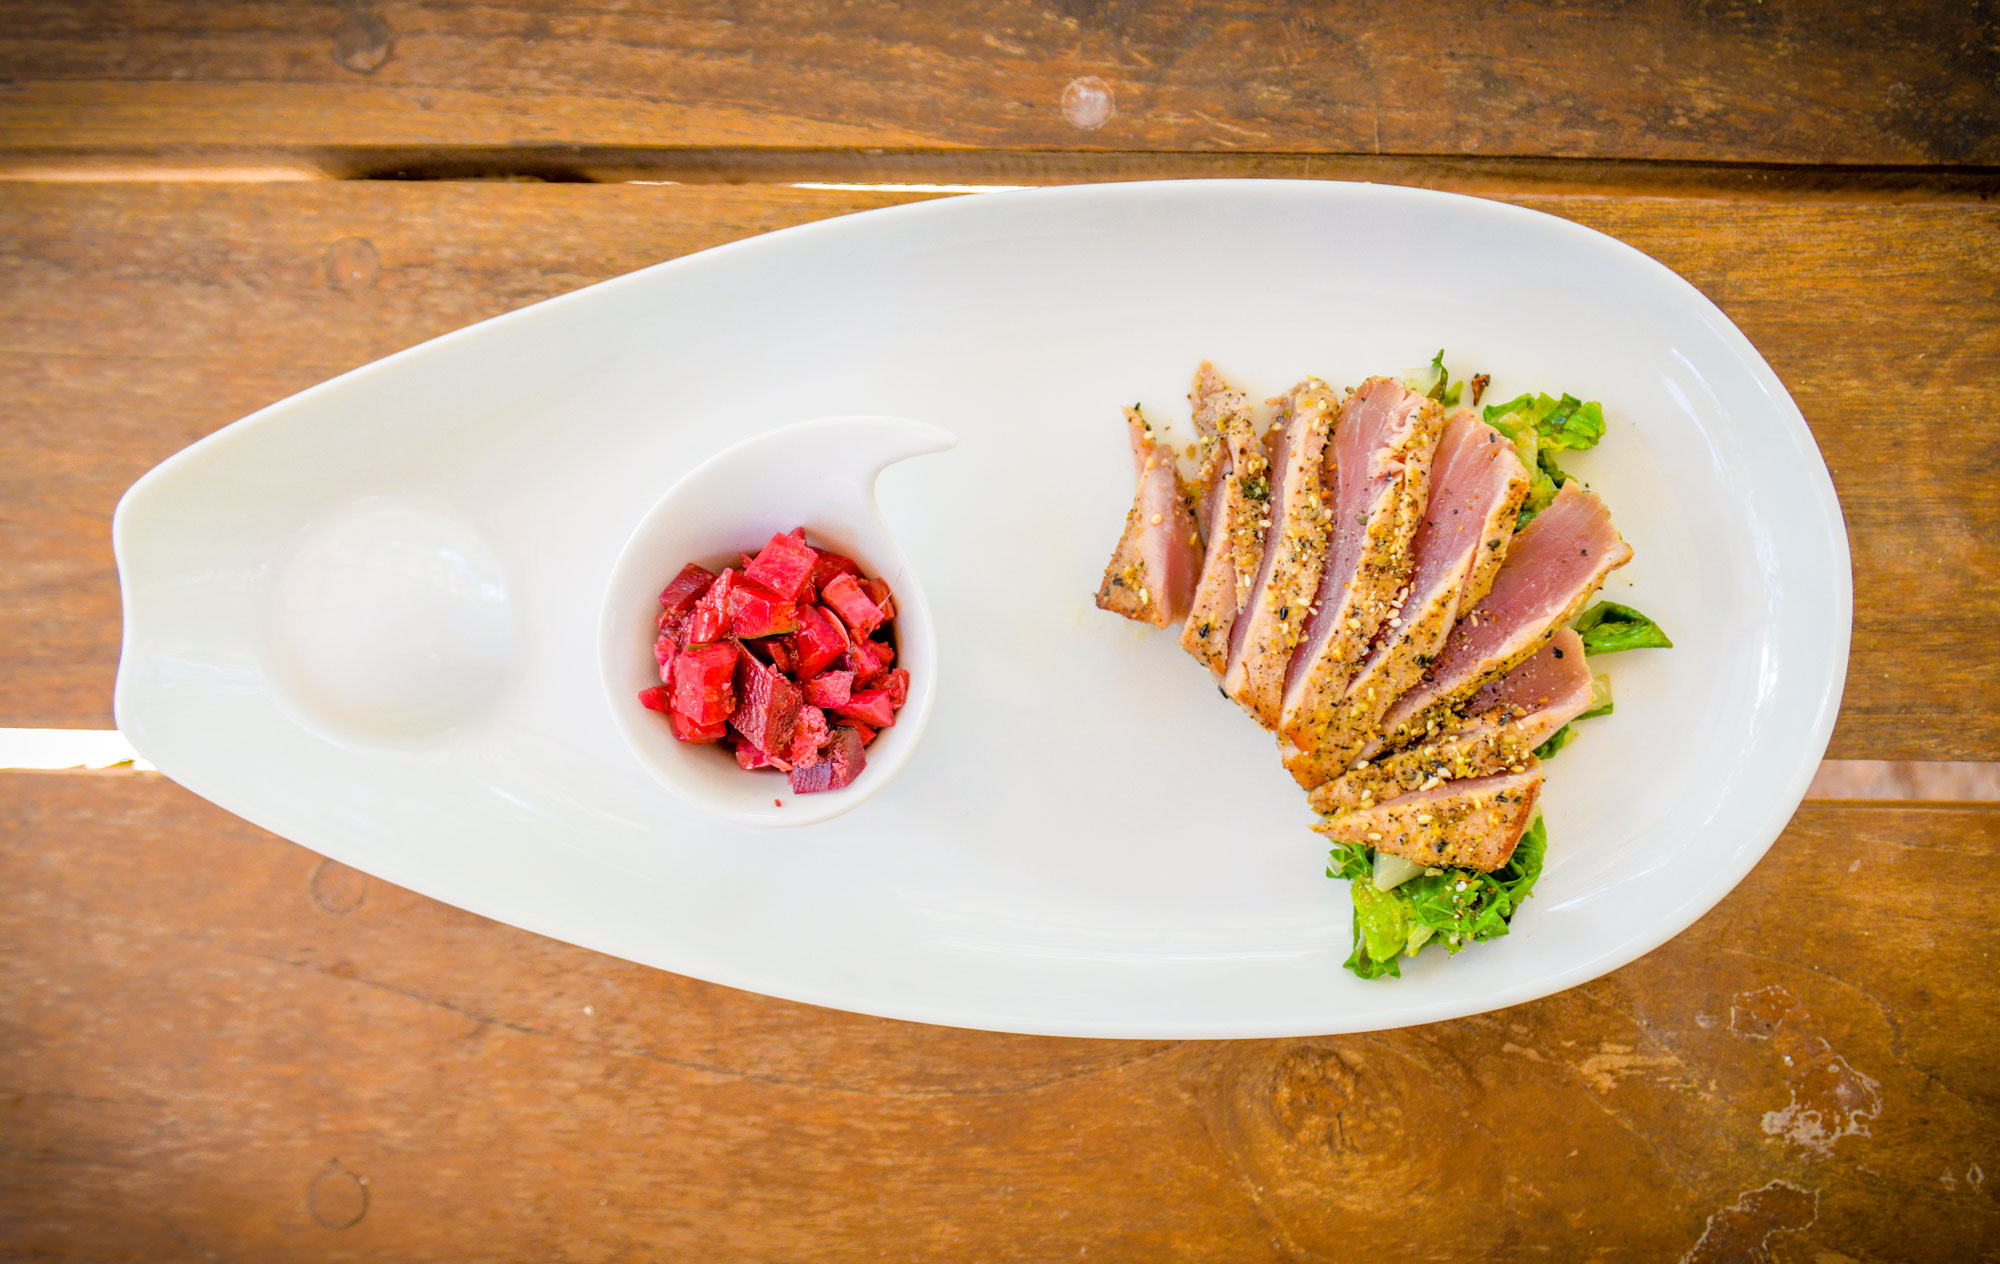 Roasted-sesame-tuna-with-ginger-juice-bok-choy-with-raddish-and-beetroot-kimchi.jpg